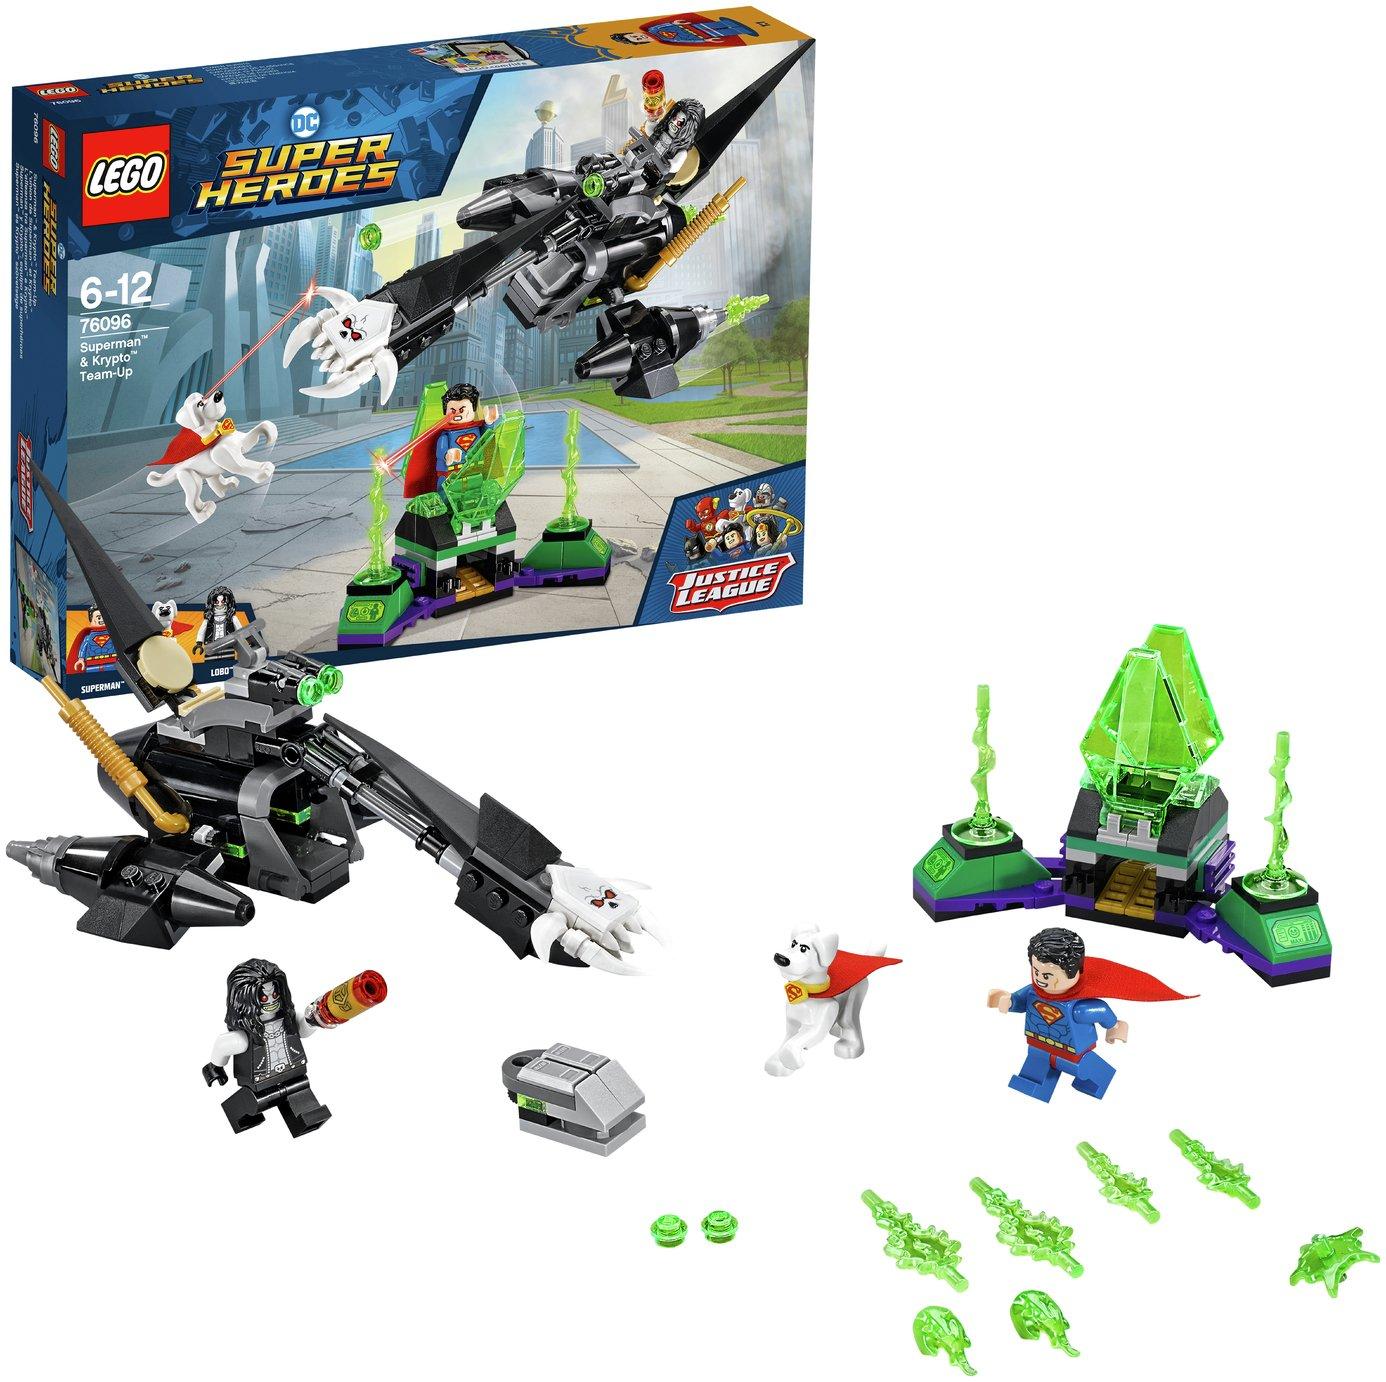 LEGO Super Heroes Superman & Krypto Team-Up - 76096